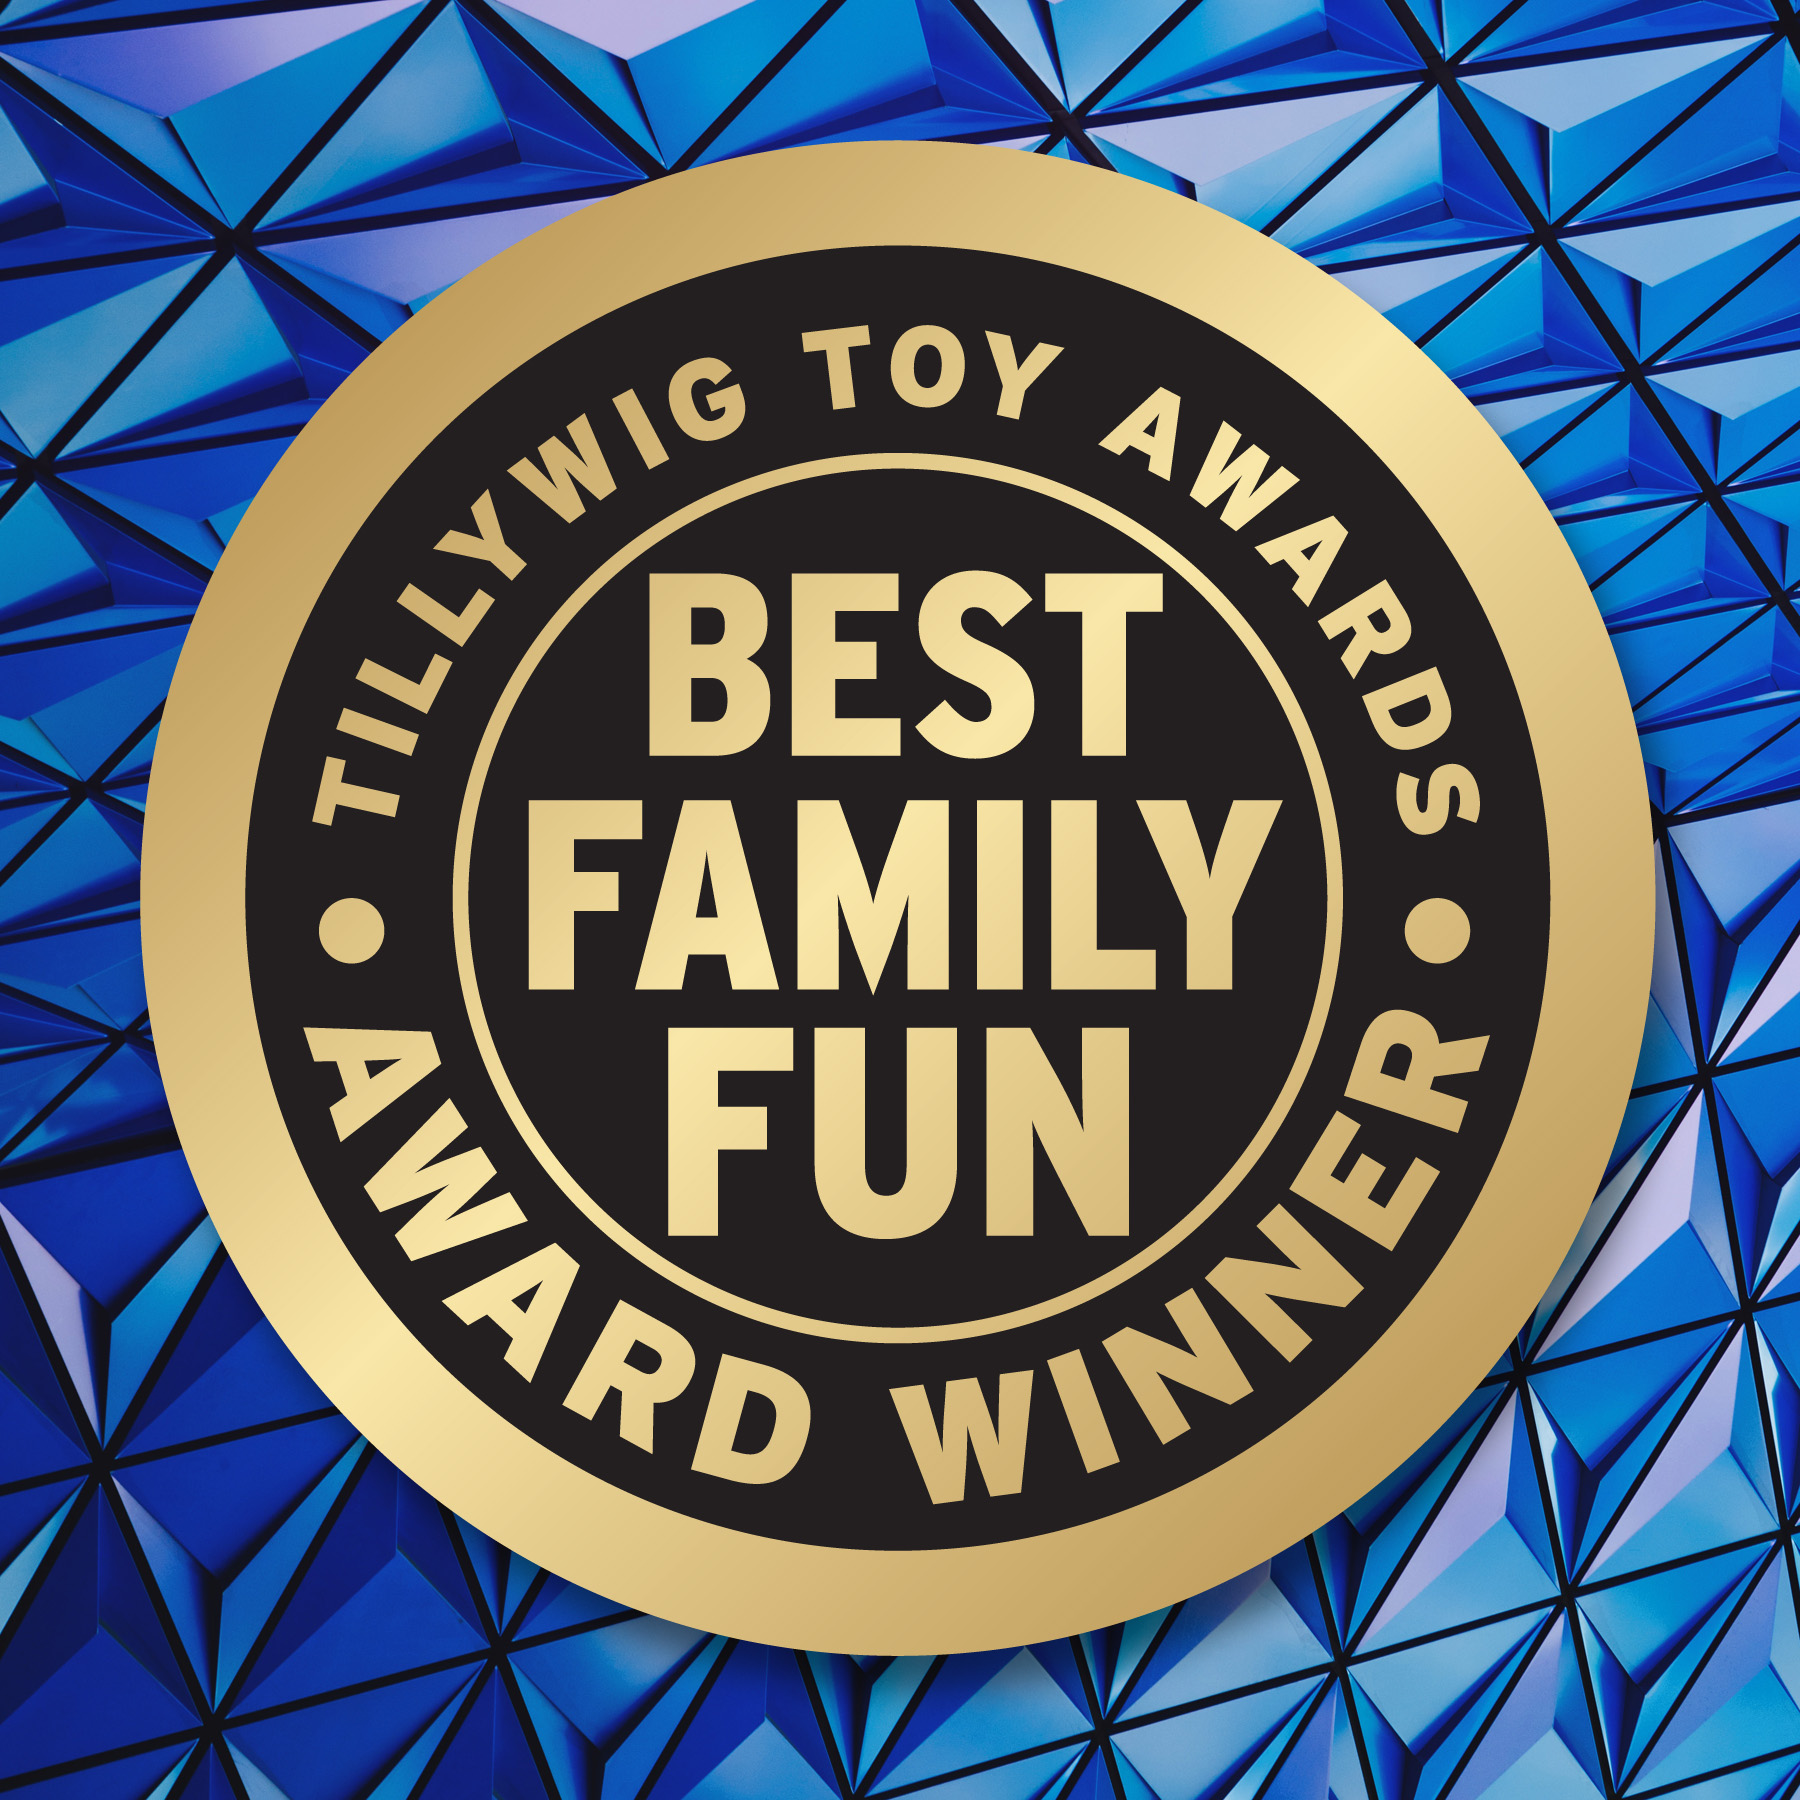 Candygrams-Family-Board-Games-Word-Game-Award-Winning-Tillywig-Unsplash.jpg